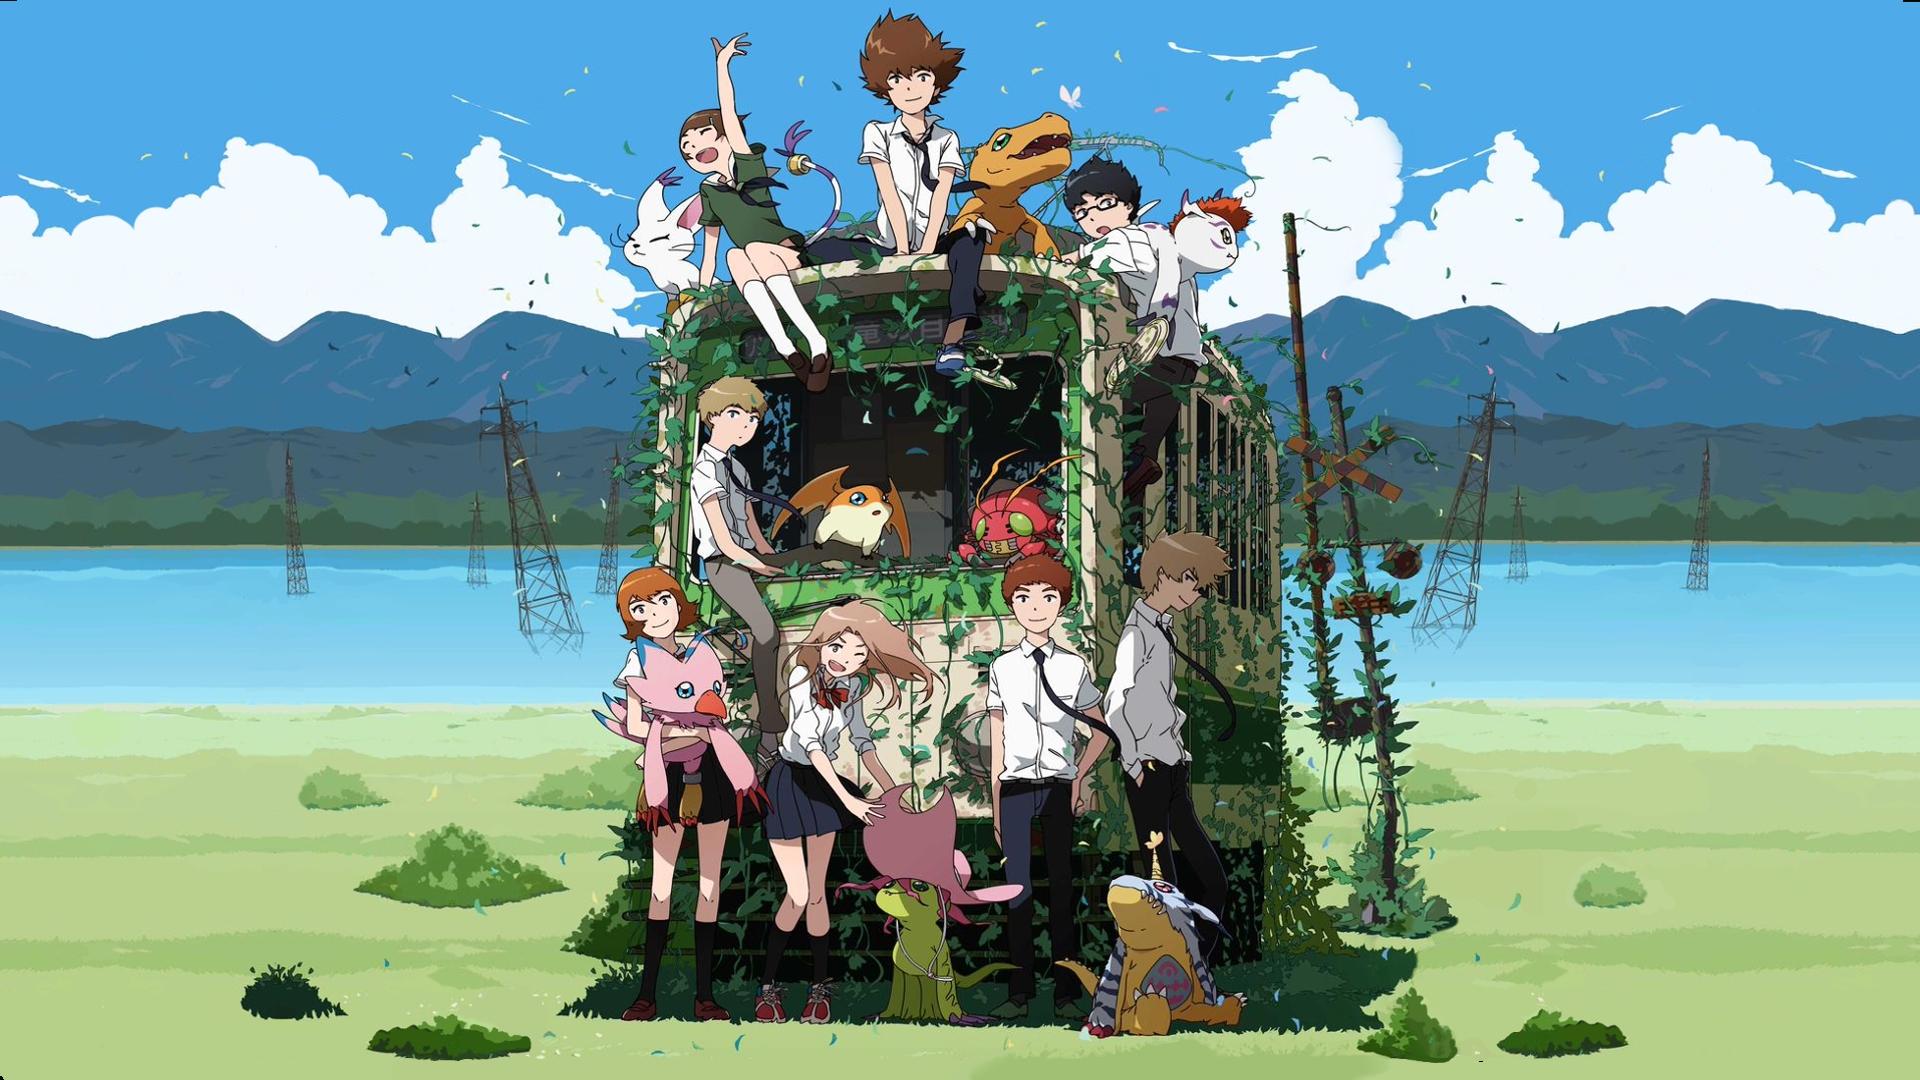 at the broken car anime digimon adventure tri wallpaper hd 2015